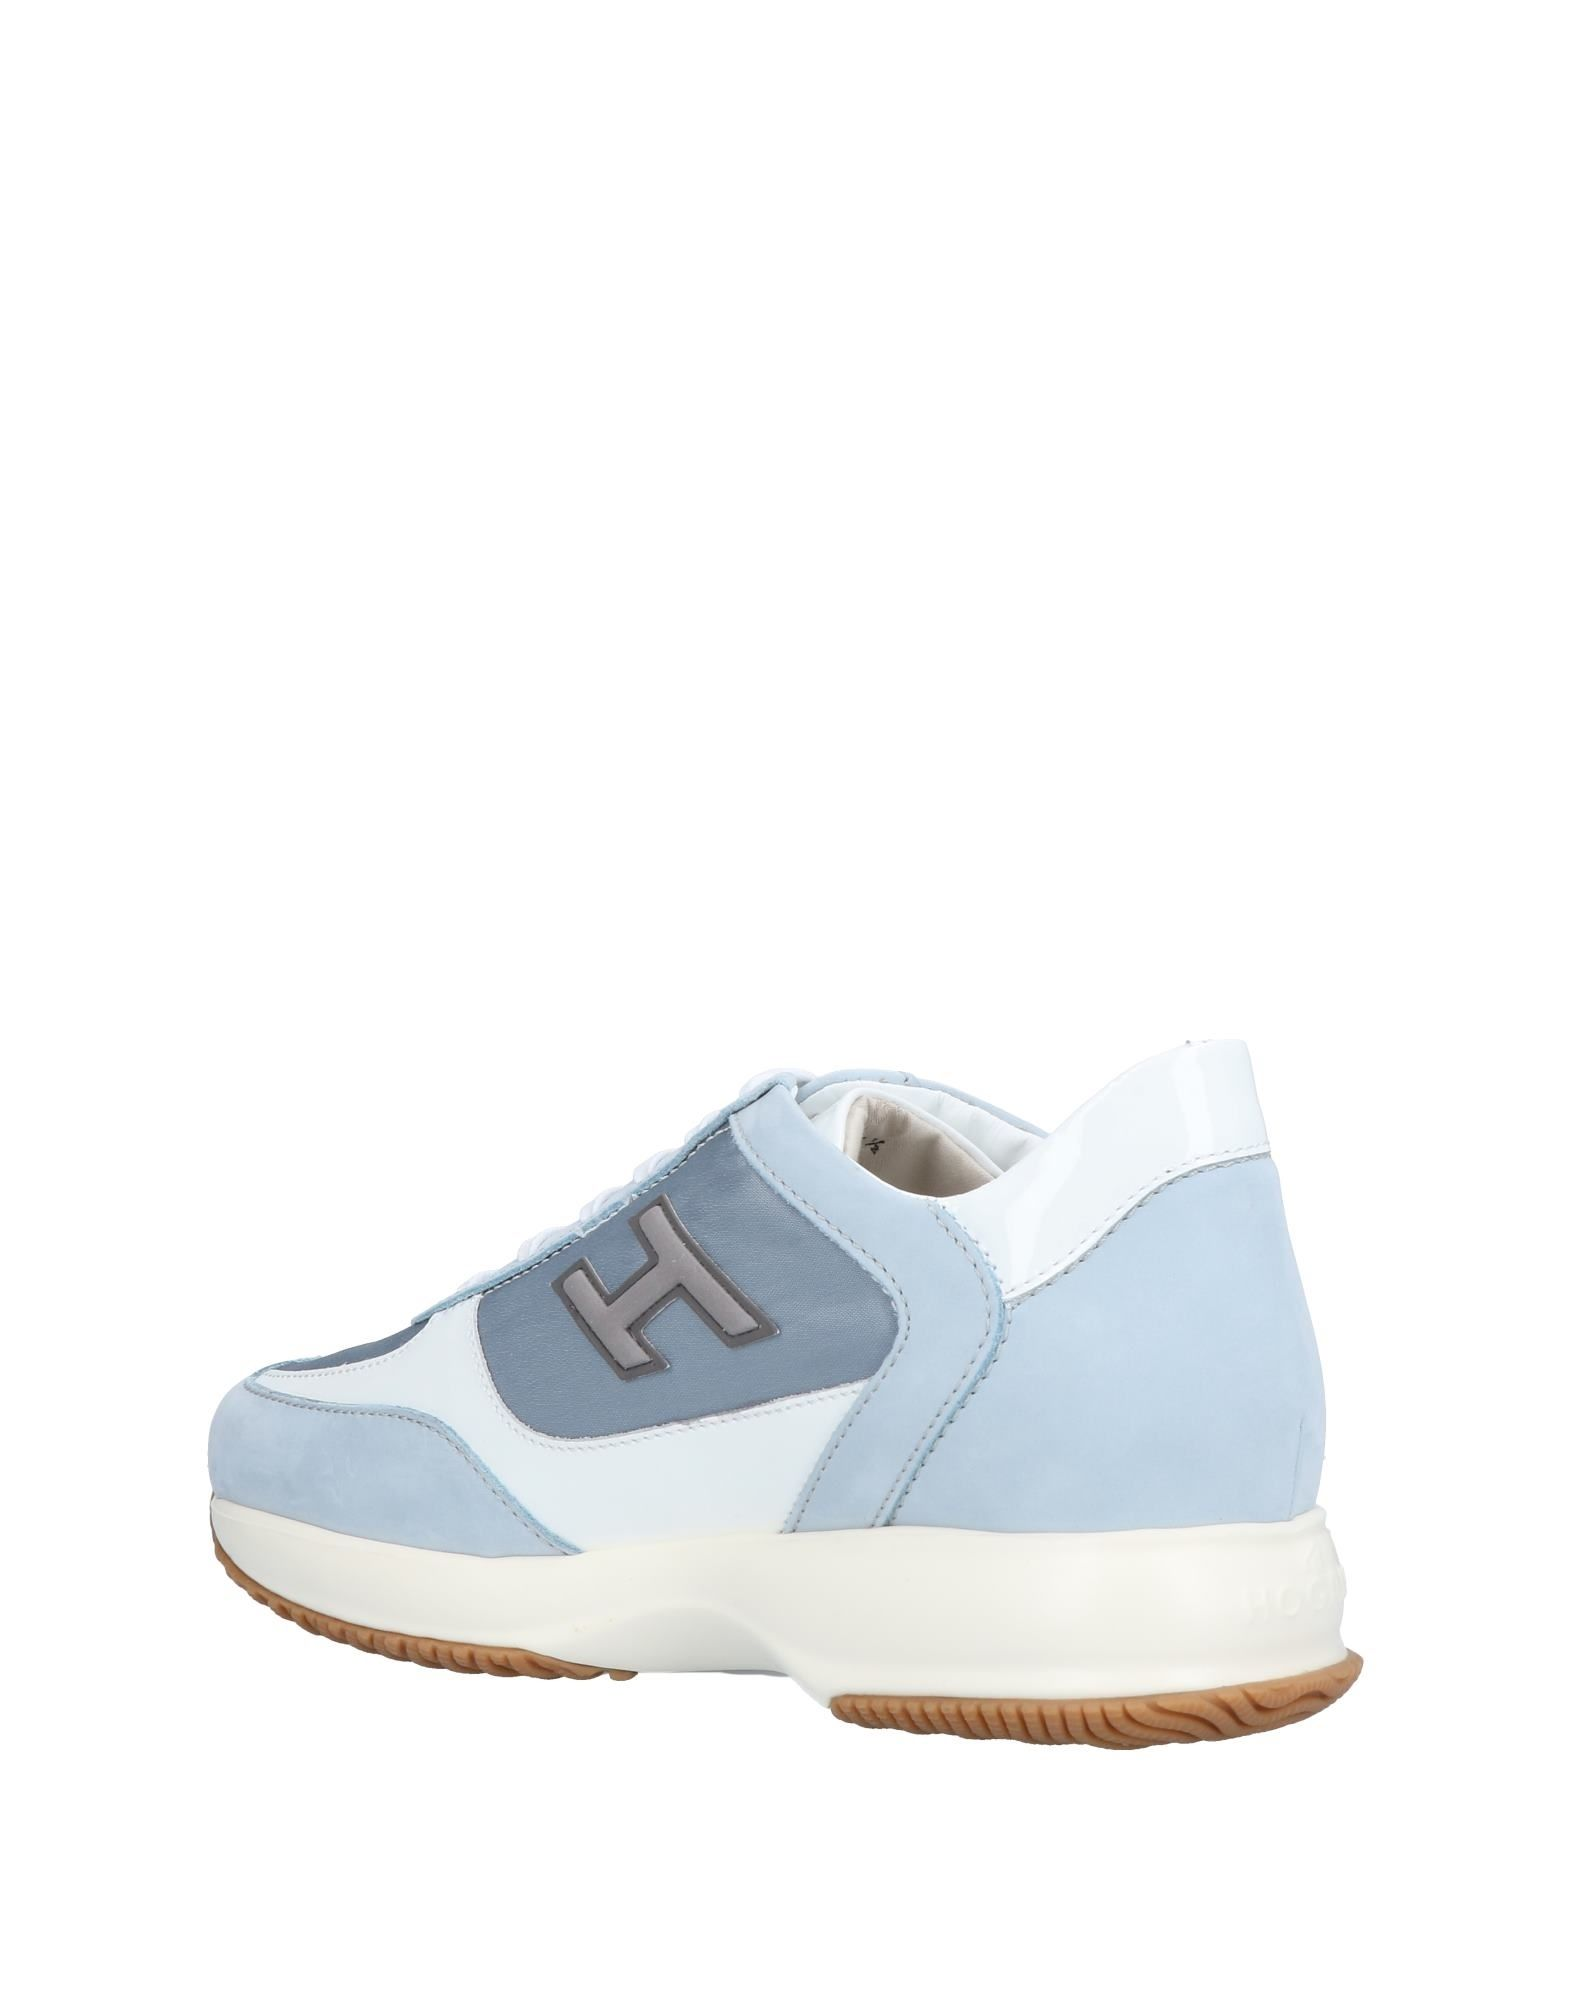 Hogan Sneakers Herren  11461157EM Gute Qualität beliebte Schuhe